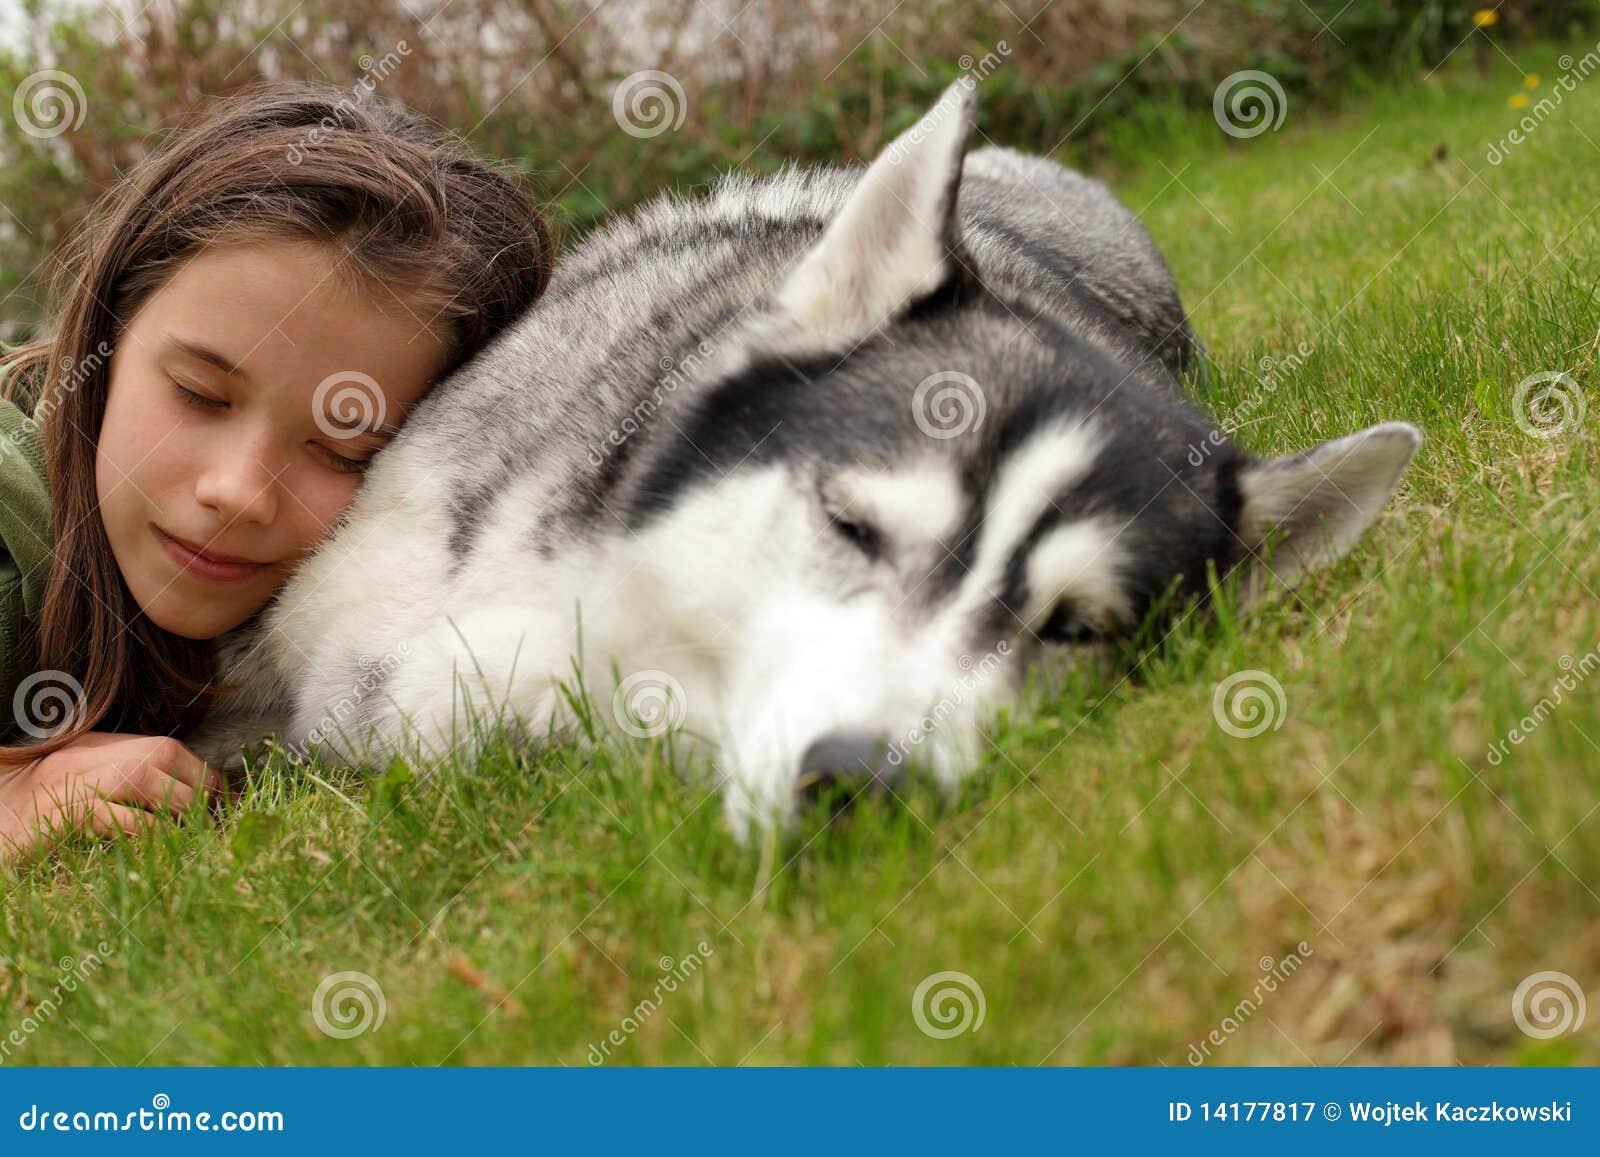 Husky girls images 11